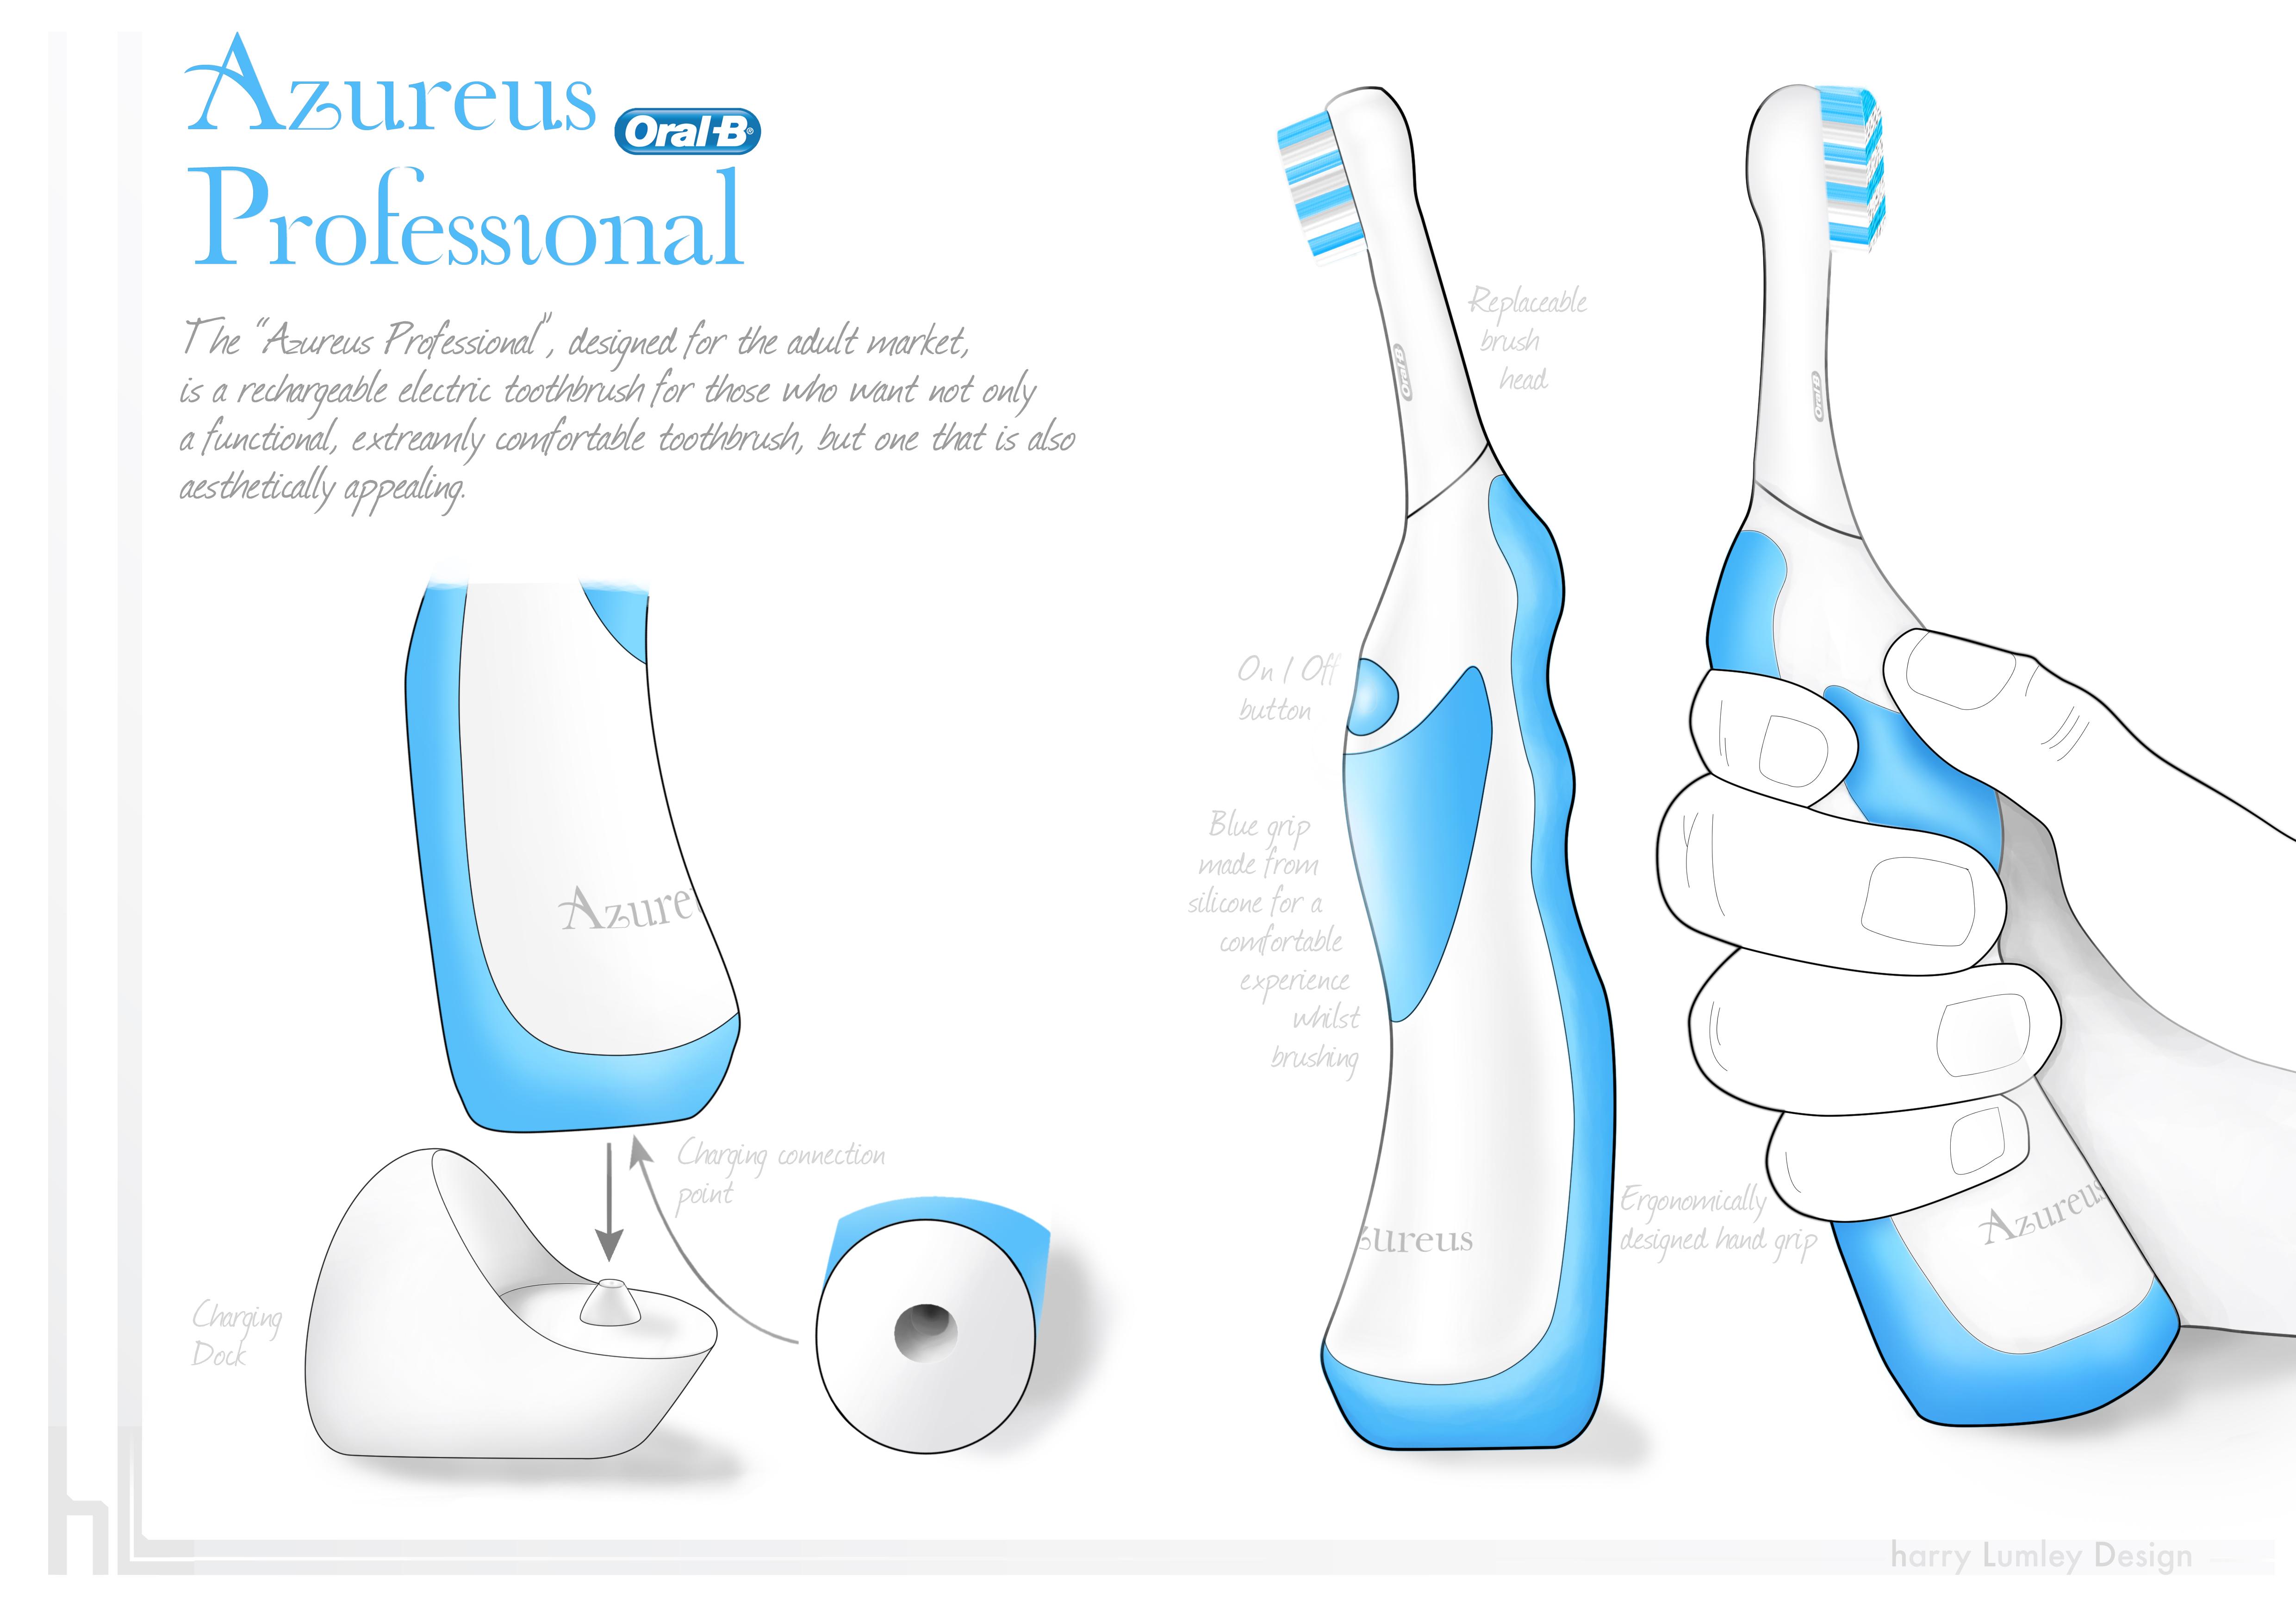 final oral b electric toothbrush design the azureus oral b